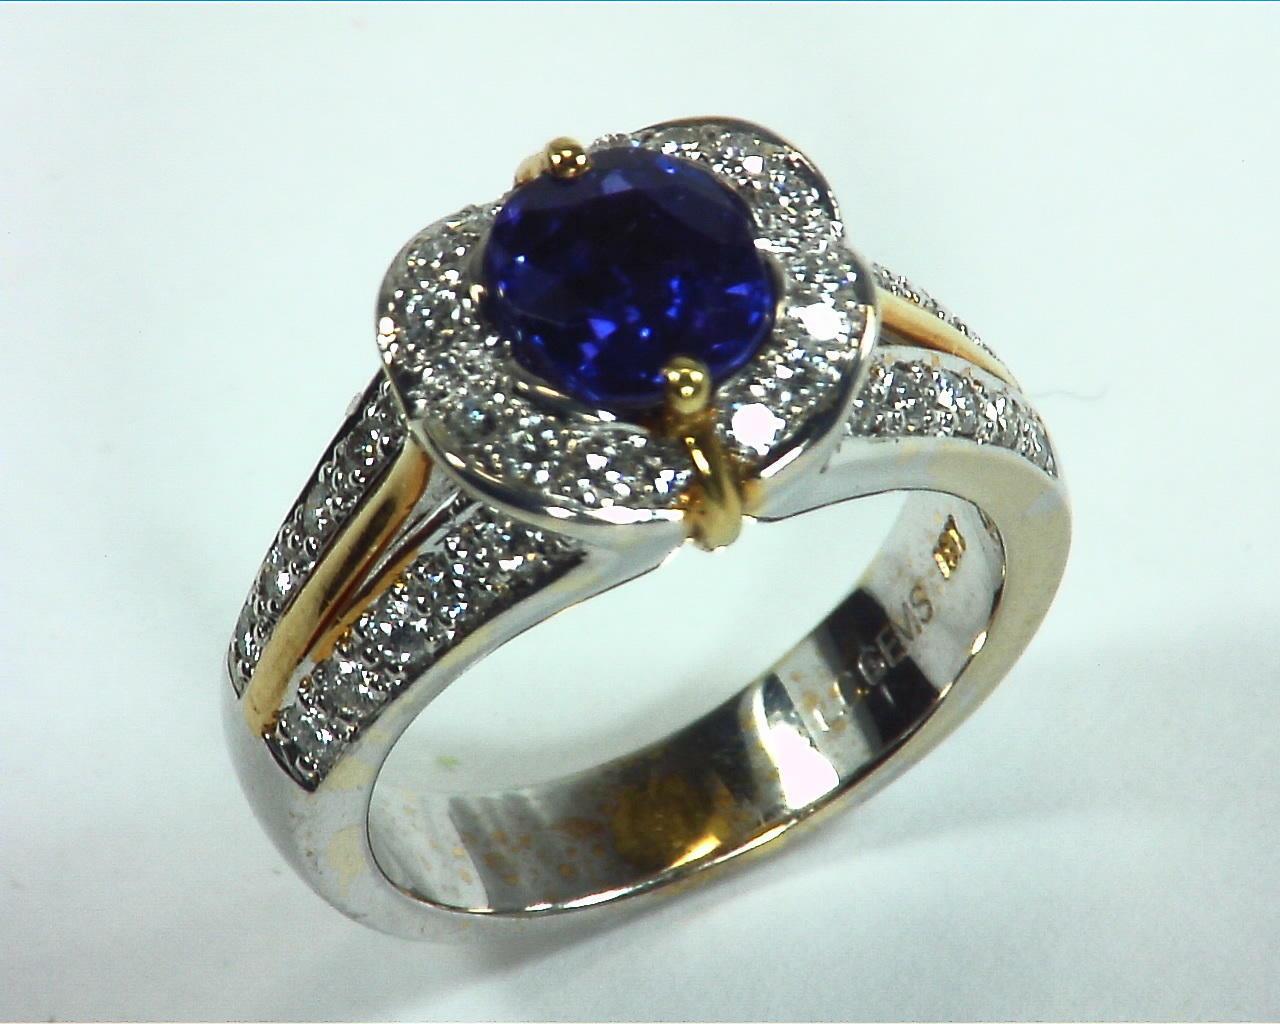 Blue Ceylon Sapphires Engagement Ring 18kt Lady,s Ring RFK,303 5